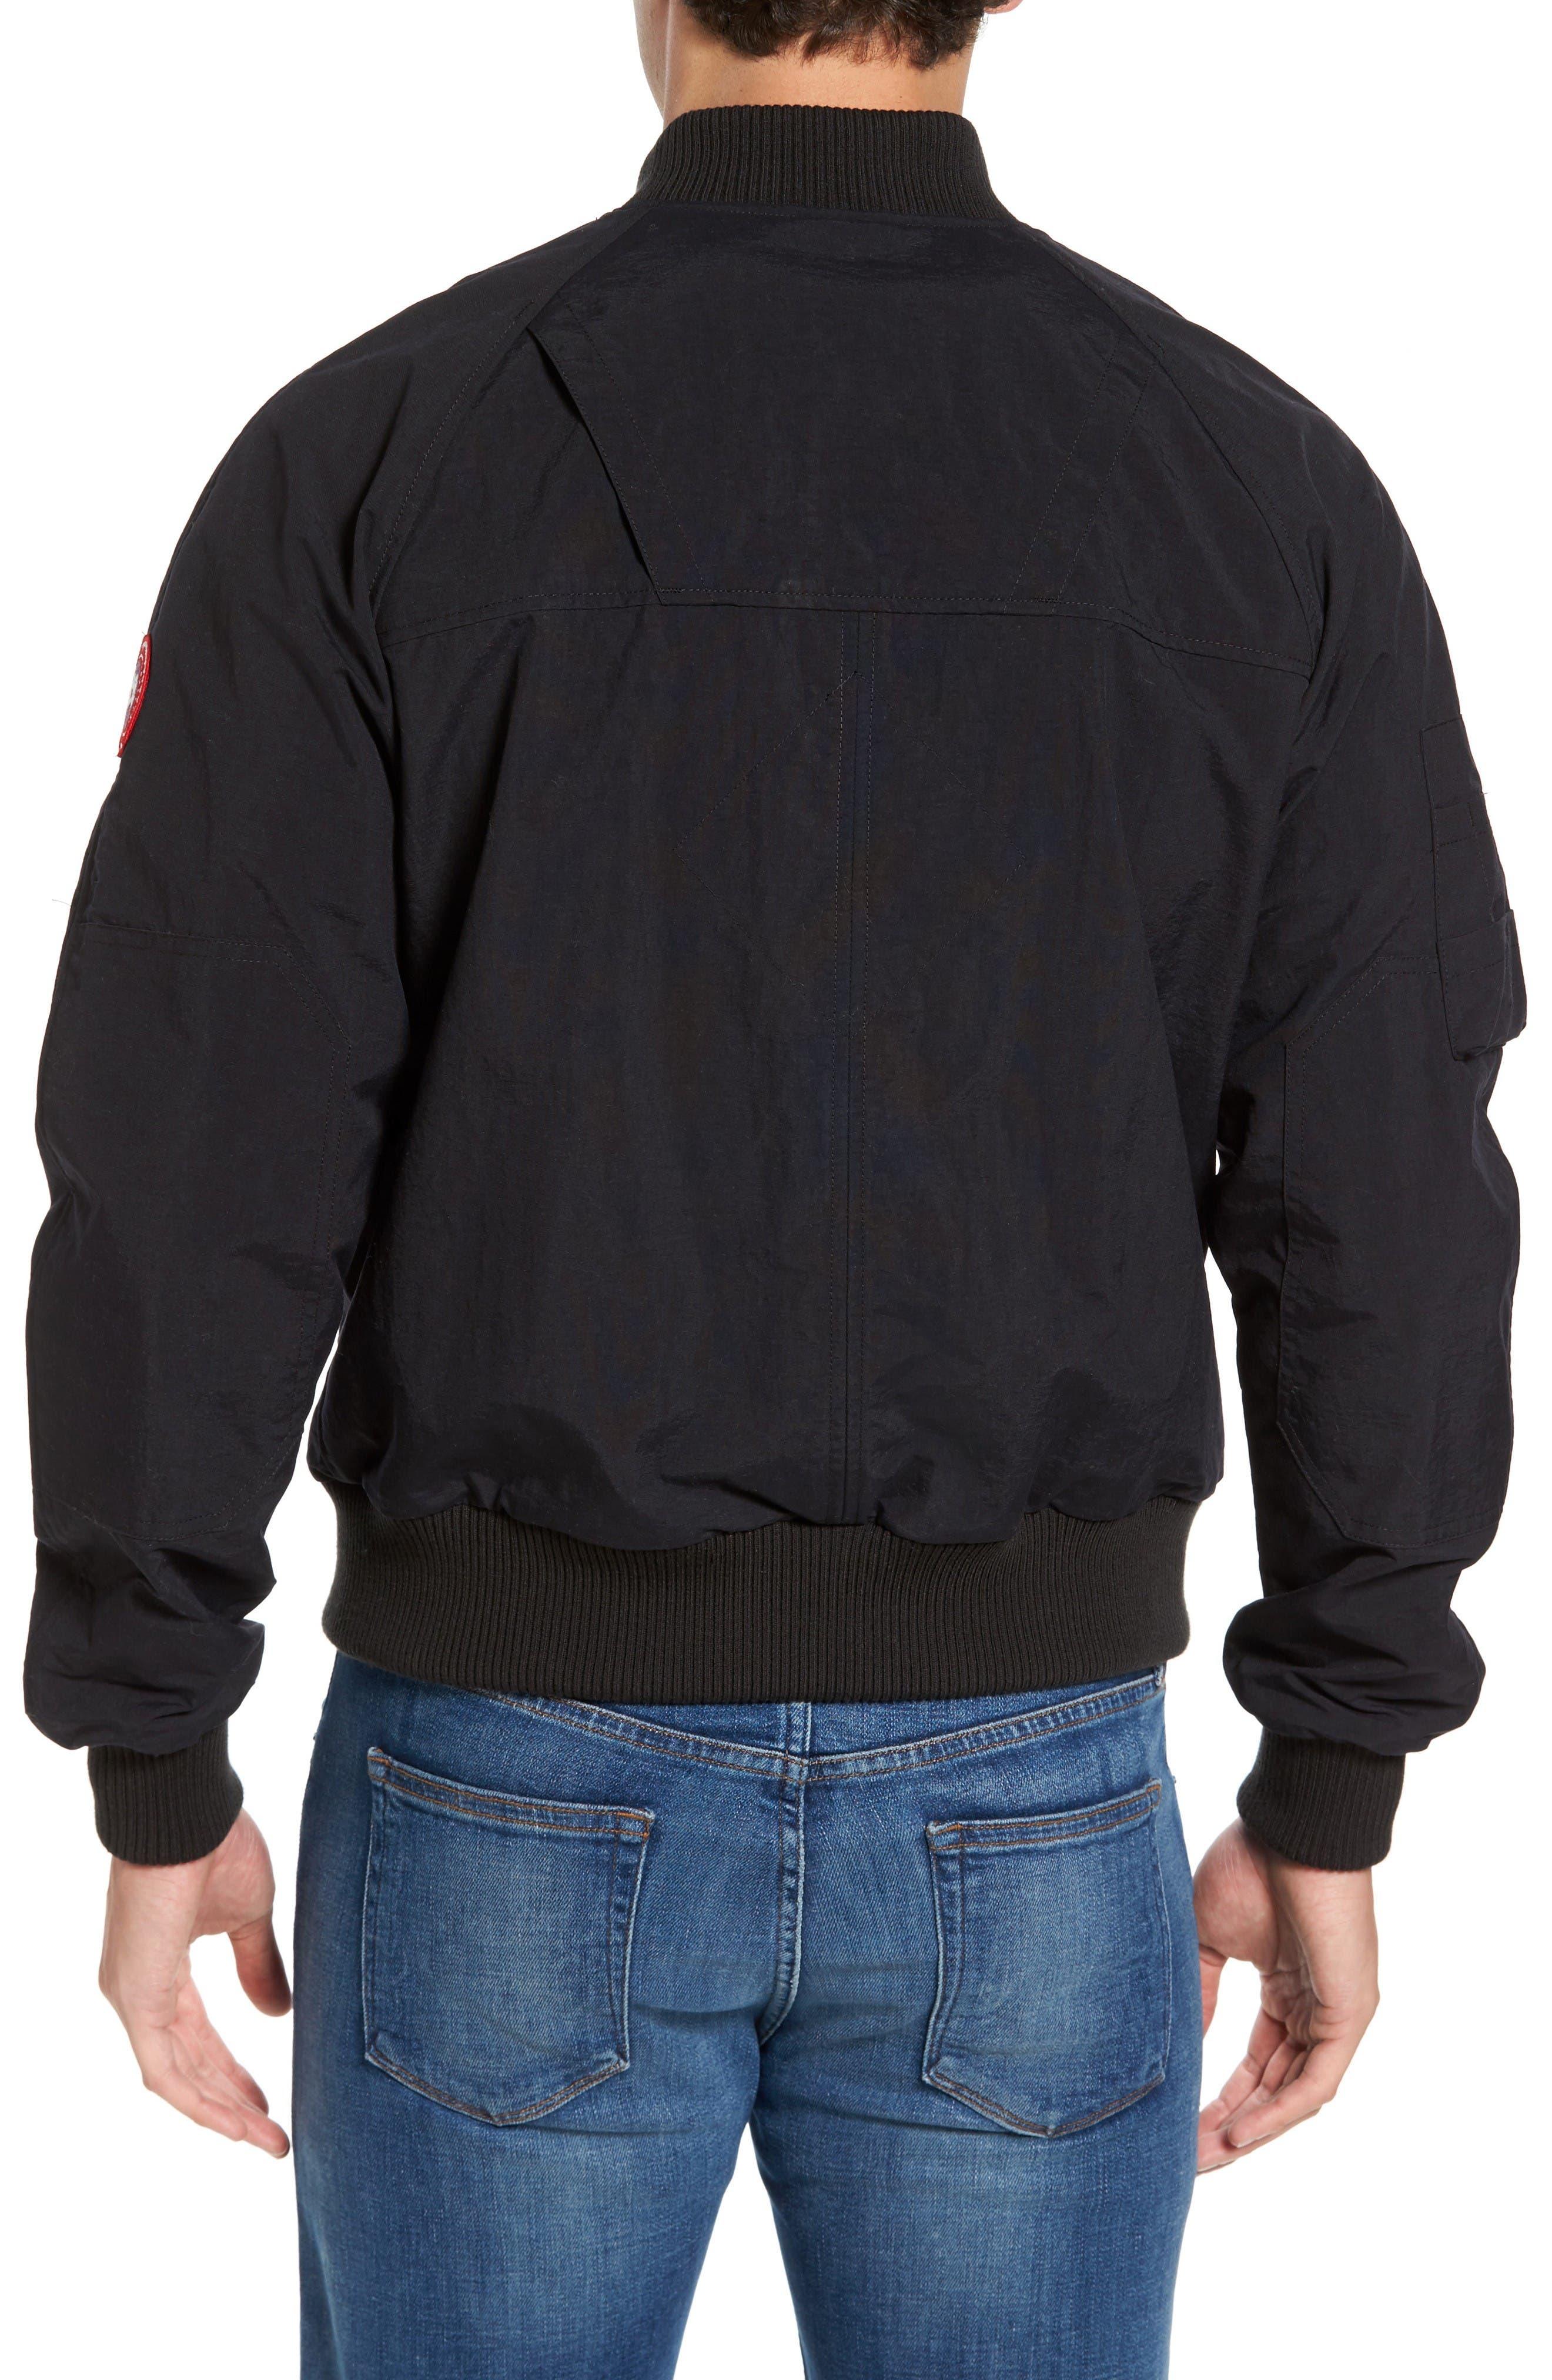 Faber Bomber Jacket,                             Alternate thumbnail 2, color,                             Black